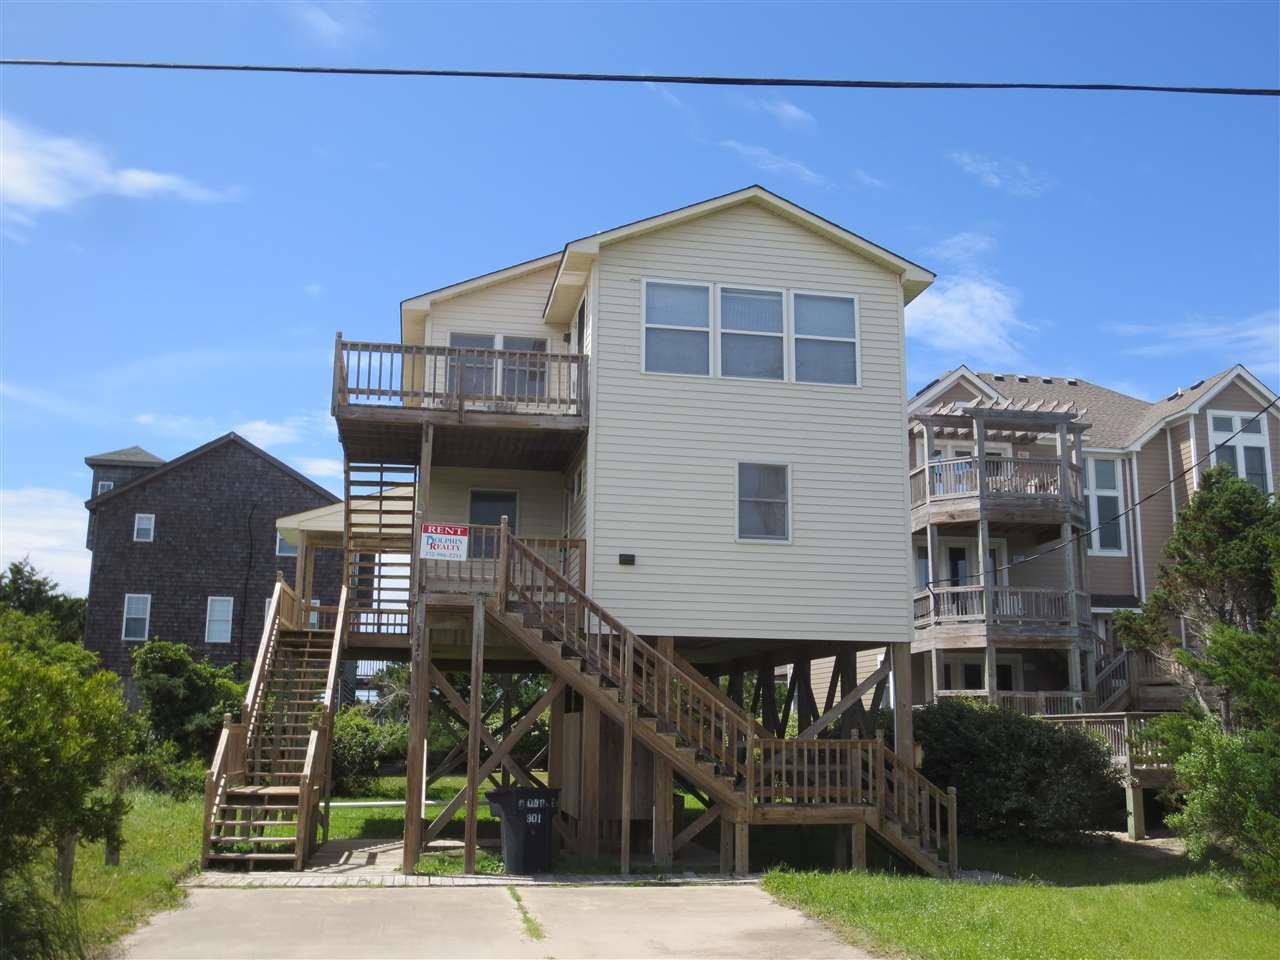 54209 Shoresurf Lane - Photo 1